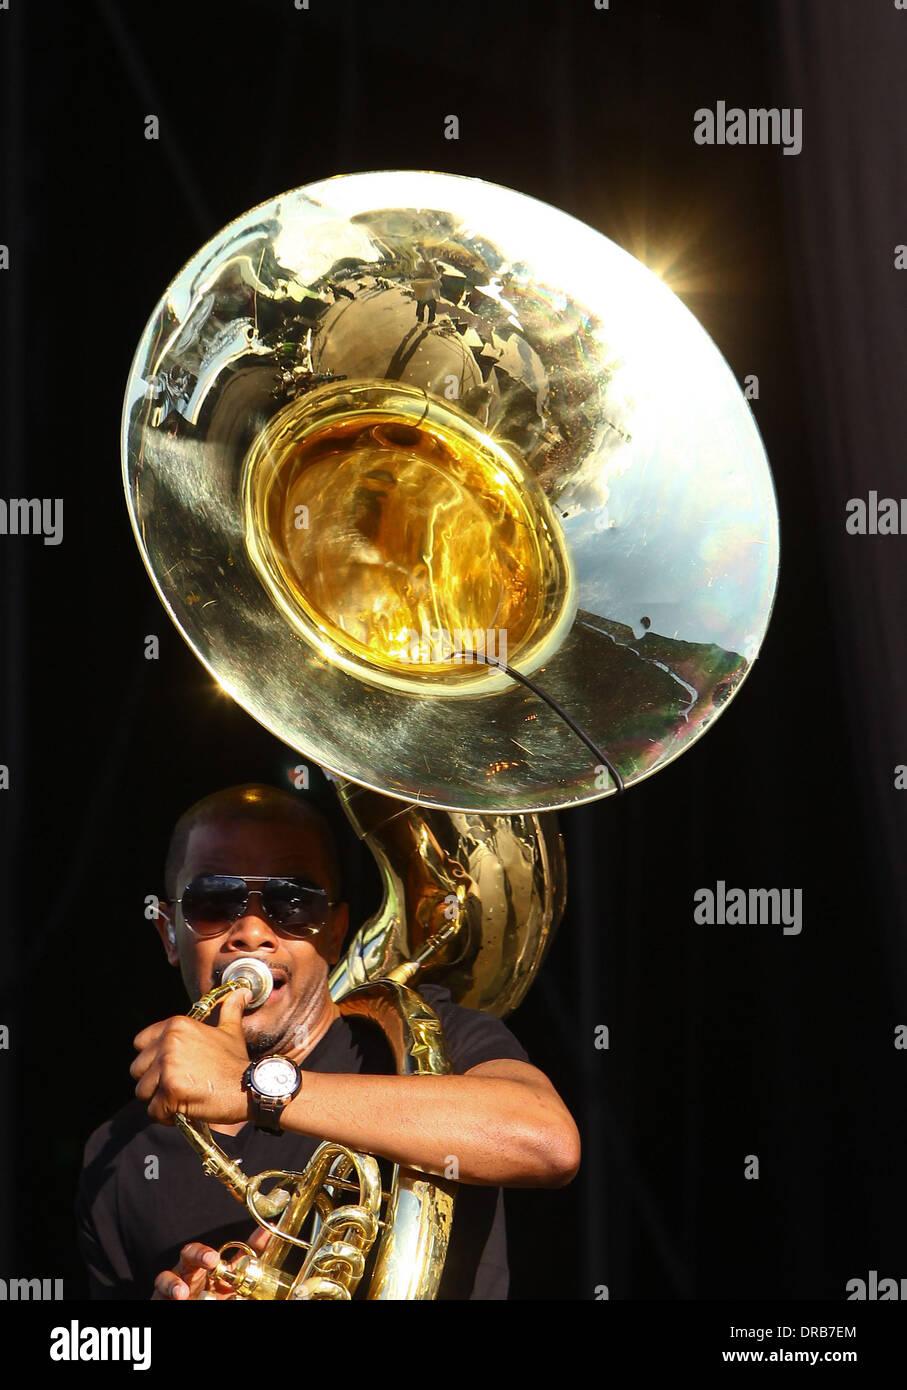 "Damon ""Tuba Gooding Jr."" Bryson of The Roots Barclaycard Wireless Festival 2012 - Day 1 London, England - 06.07.12 Stock Photo"